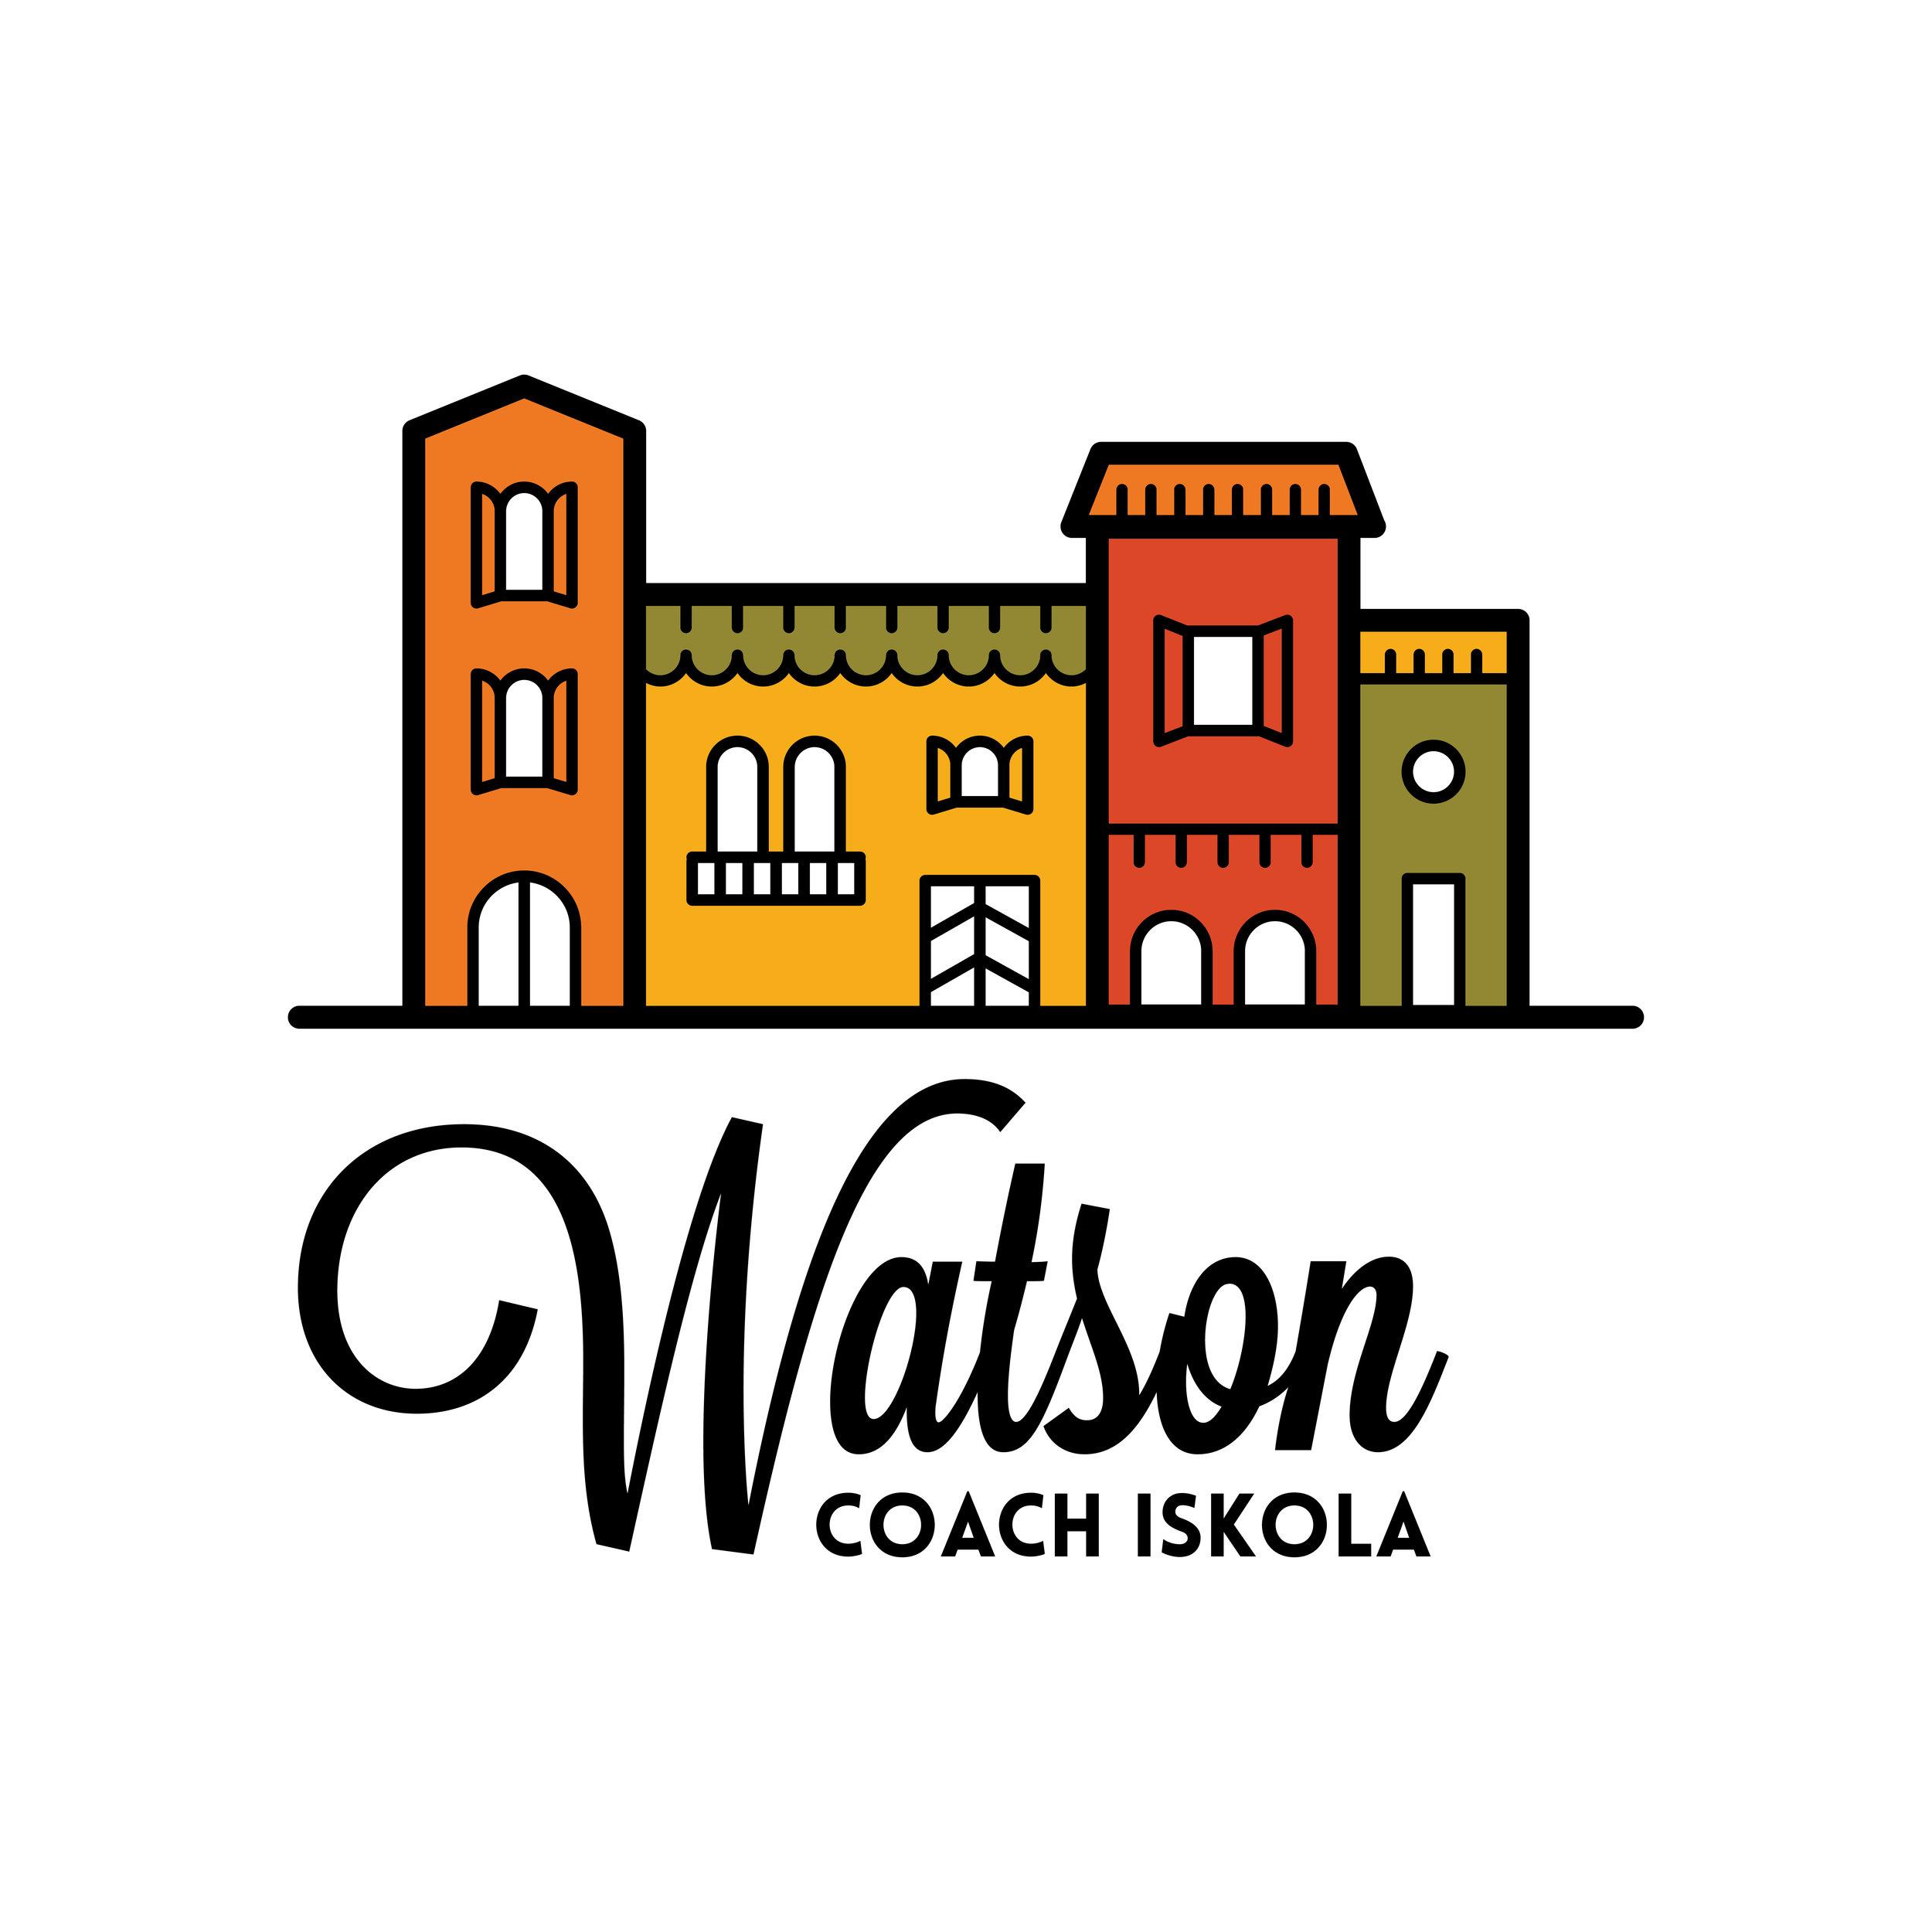 watson_coach_iskola_800x800px-colour.jpg